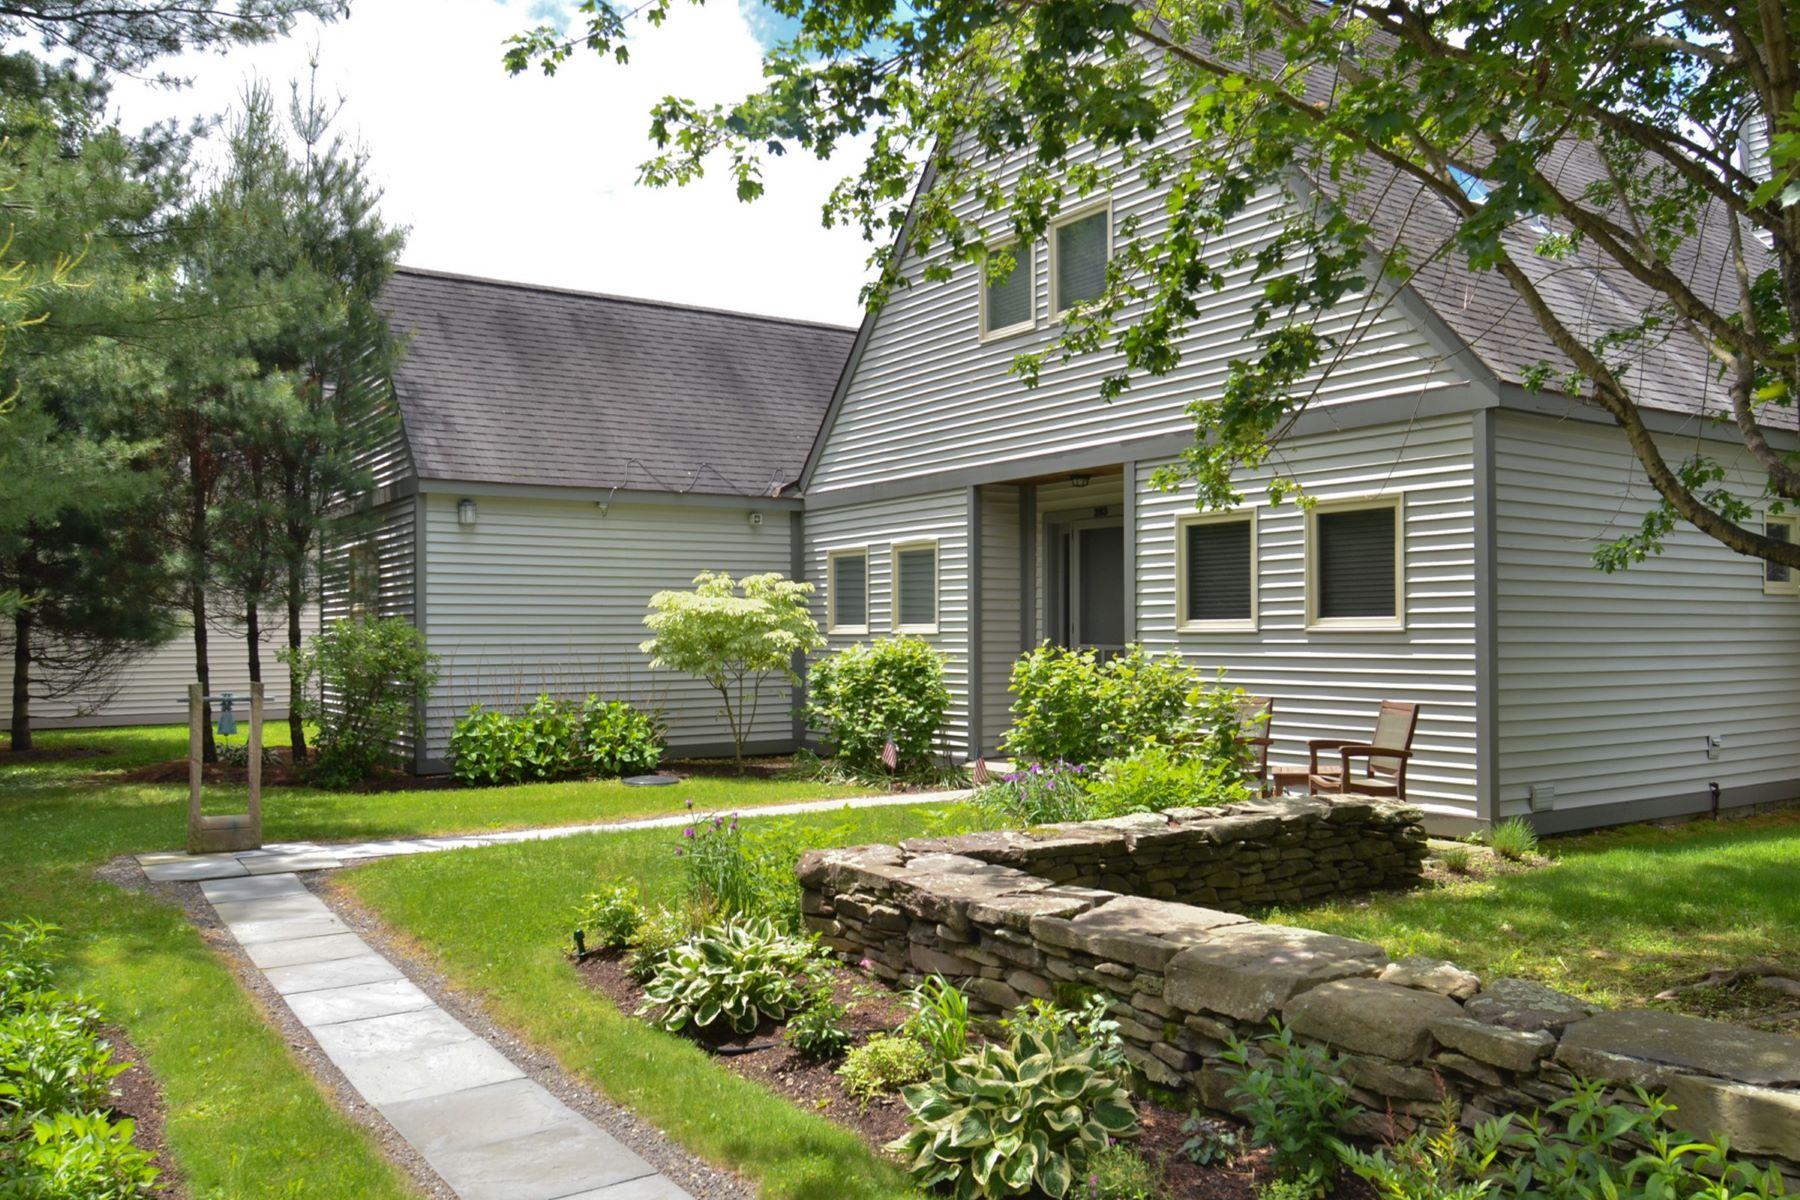 独户住宅 为 销售 在 Casually Elegant Lakefront Home 283 Arcadia Dr 安克拉姆, 纽约州 12502 美国